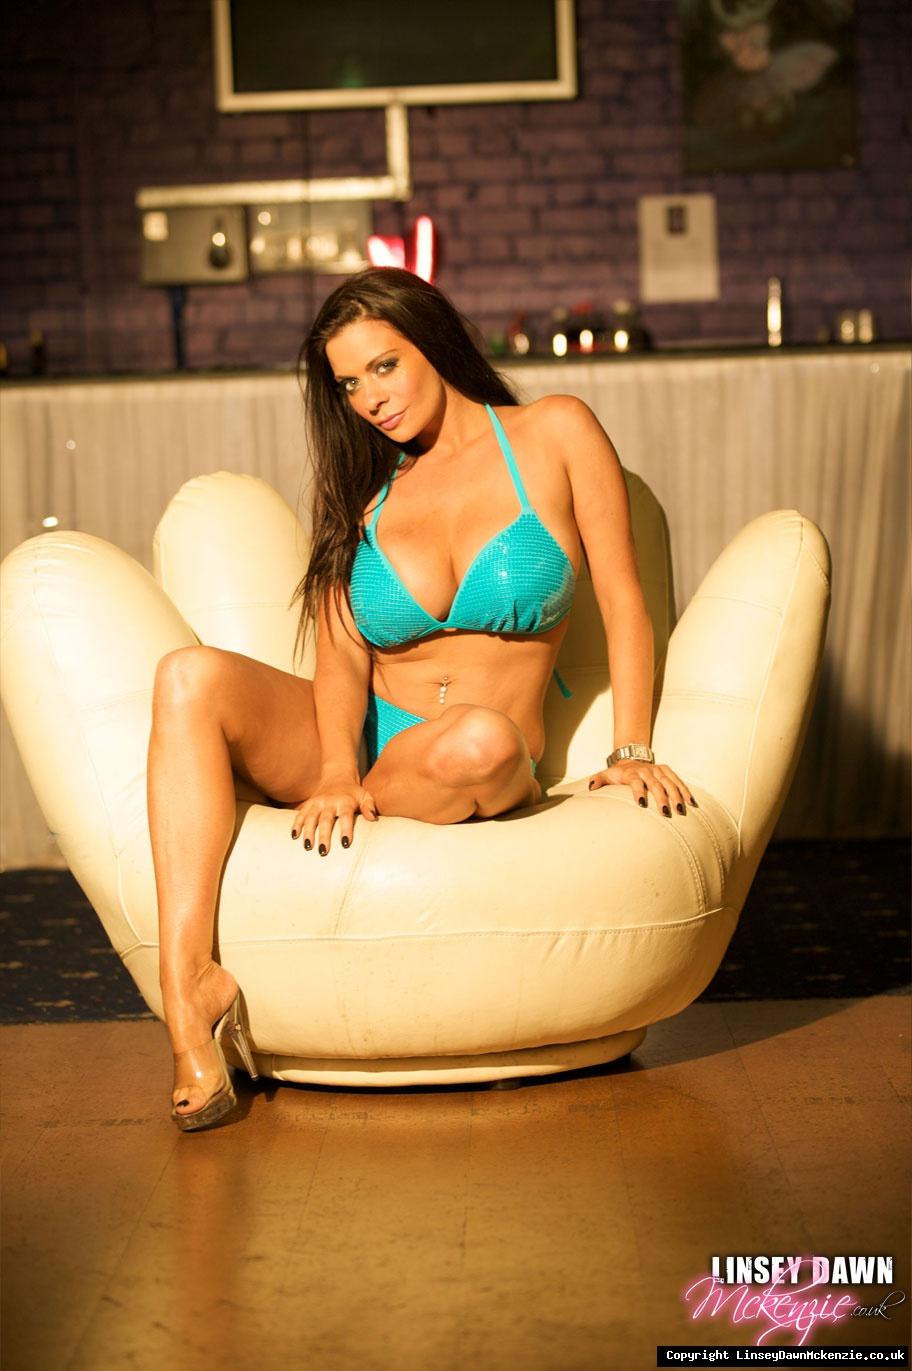 Linsey Dawn McKenzie Huge Tits in Turquoise Bikini